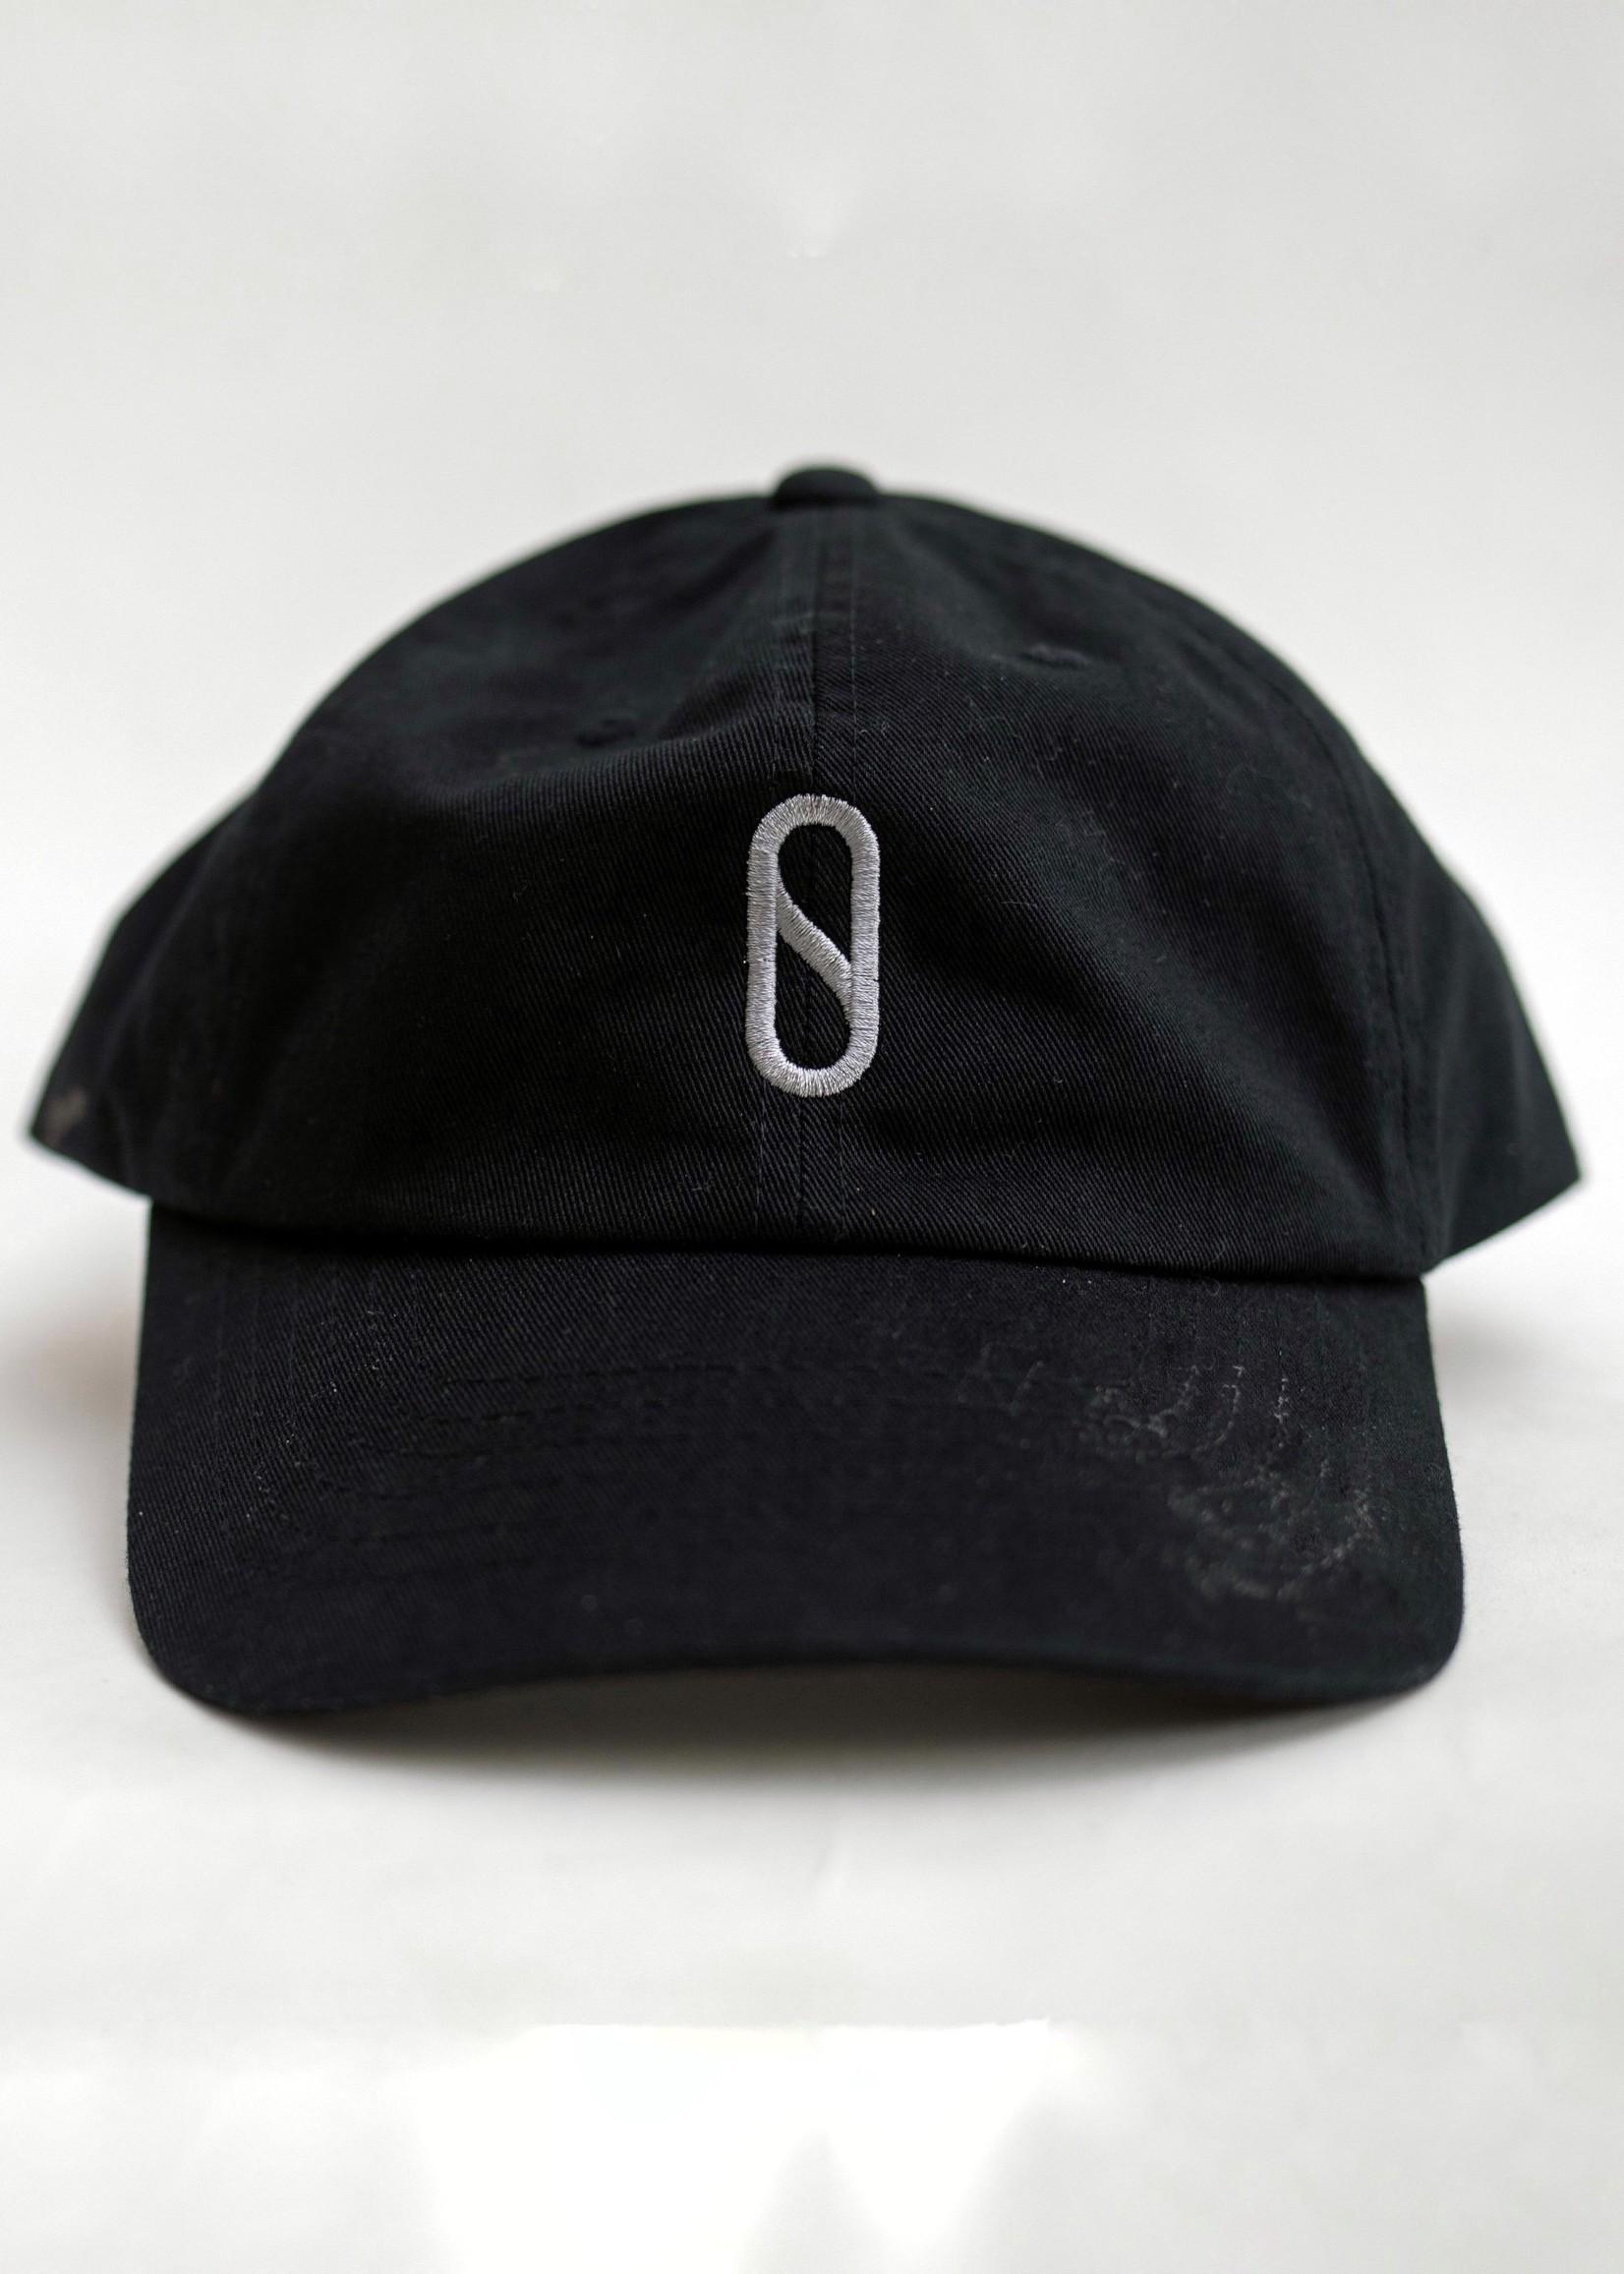 FIREWIRE Firewire Slater Designs Pill Dad Hat